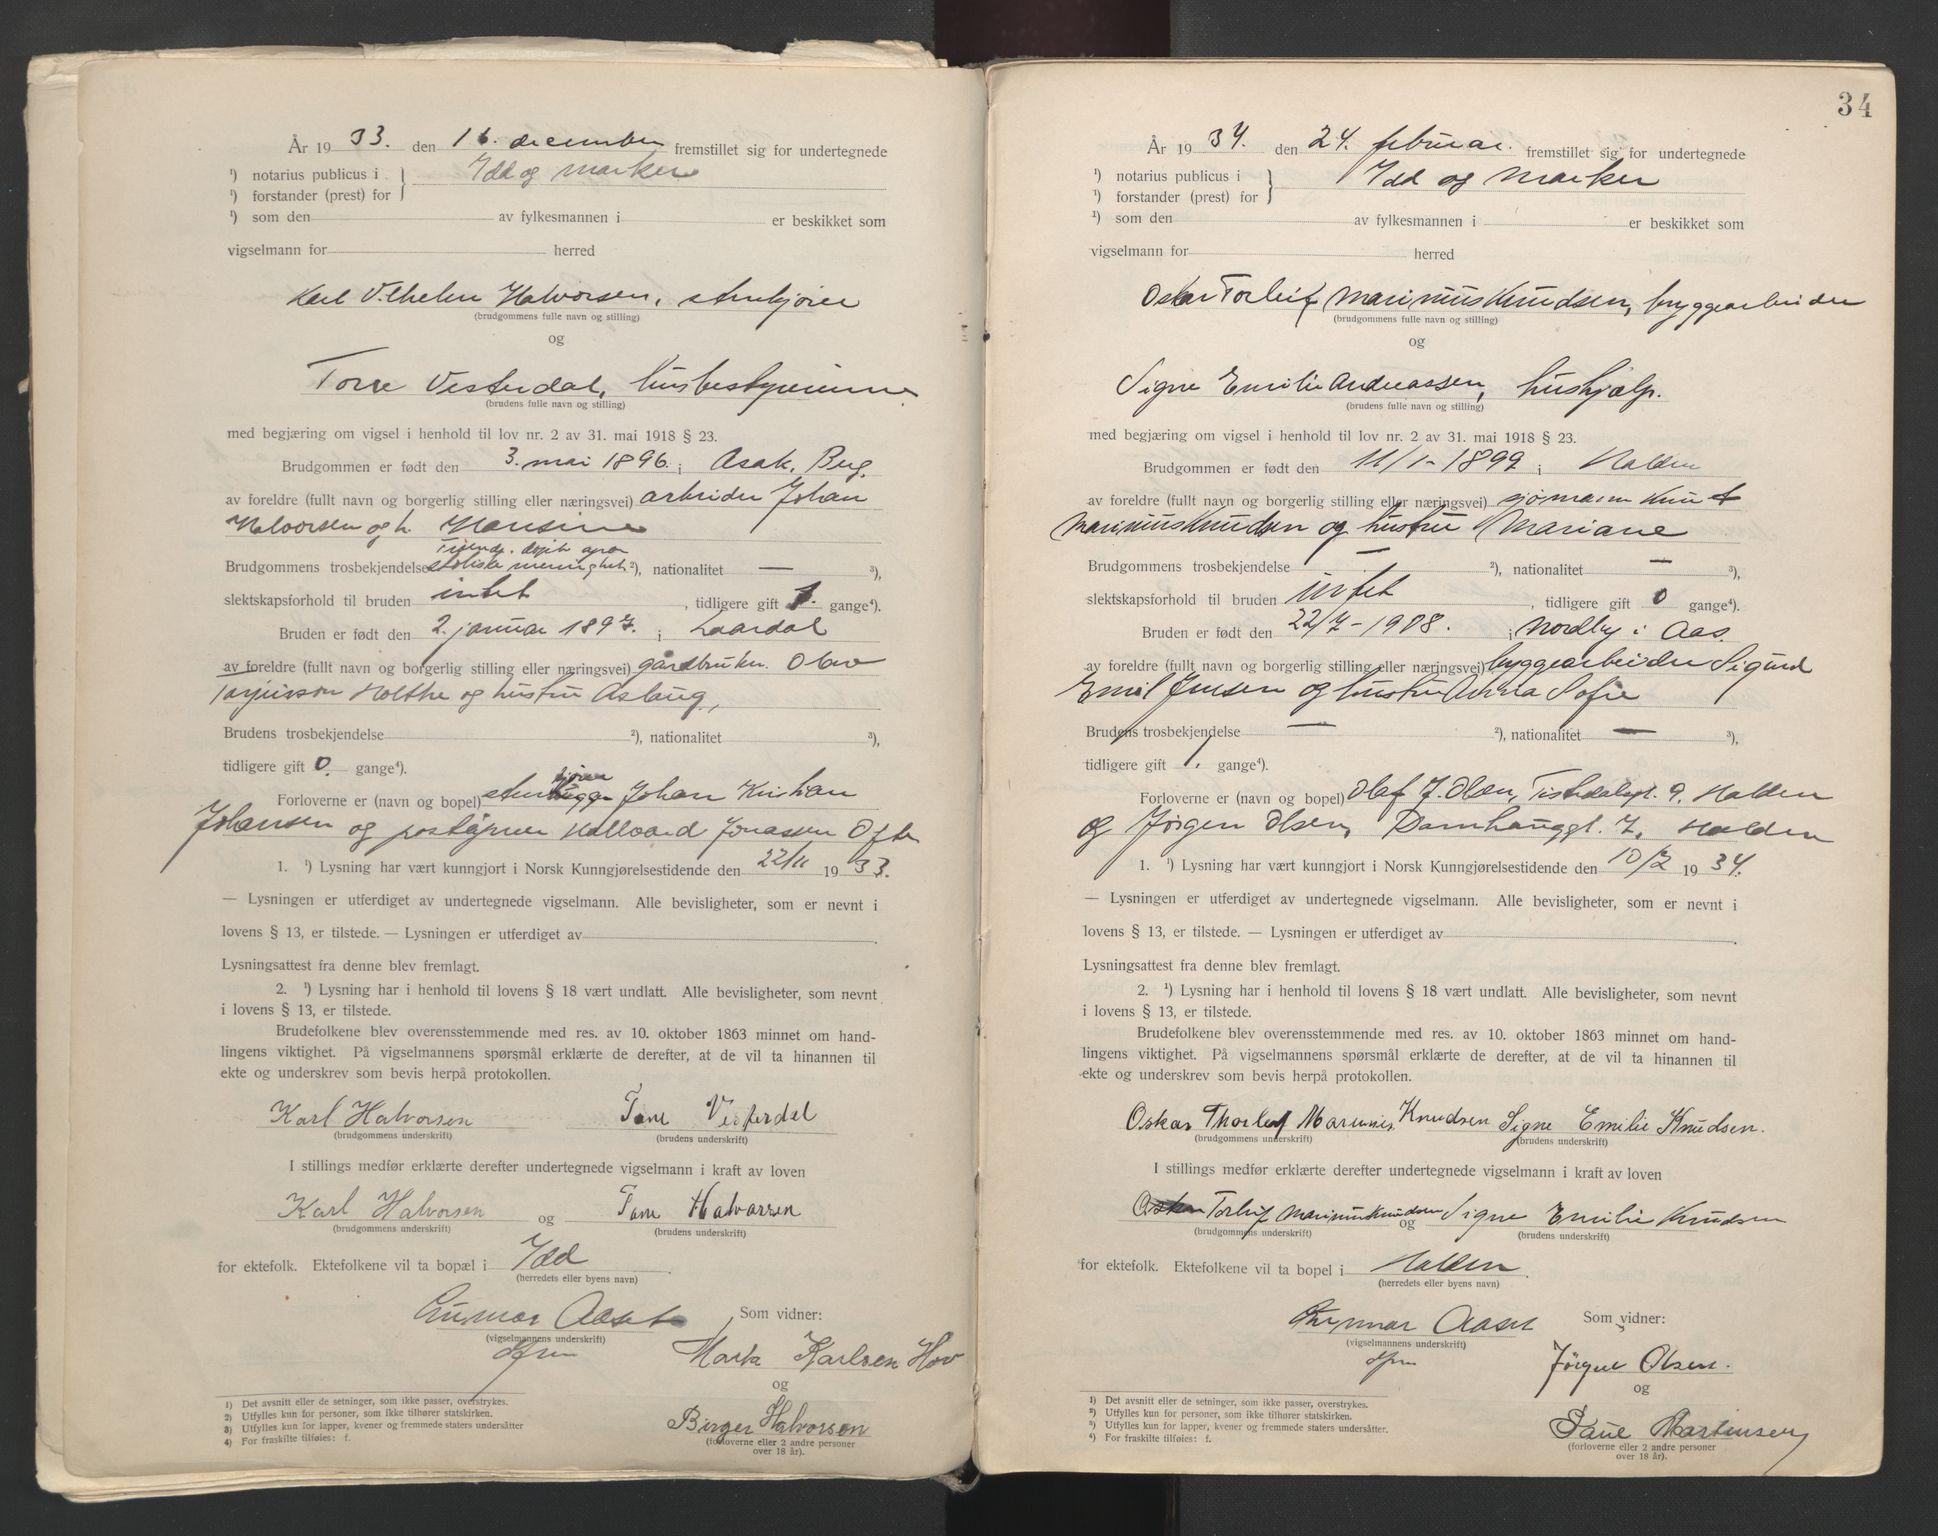 SAO, Idd og Marker sorenskriveri, L/Lc/L0001: Vigselsbøker, 1920-1942, s. 34